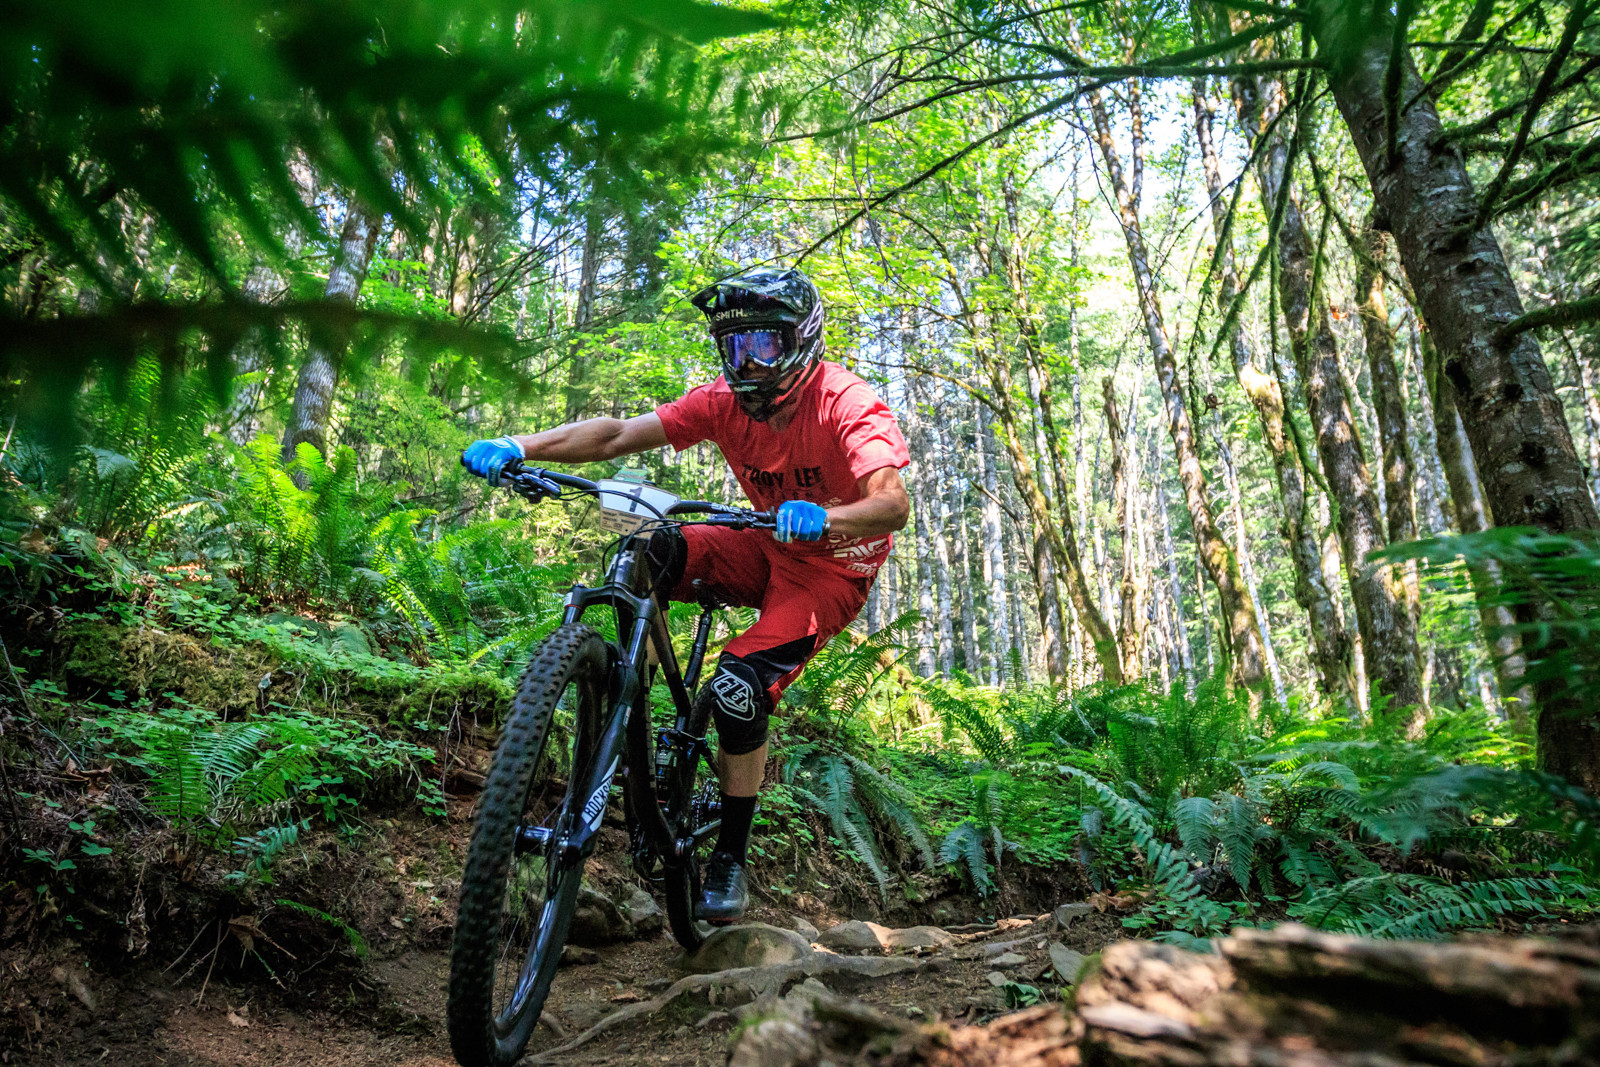 Oregon Enduro Series Finals - Alex McGuinnis Taking the Win - 2015 Oregon Enduro Series Finals Mt. Hood - Mountain Biking Pictures - Vital MTB